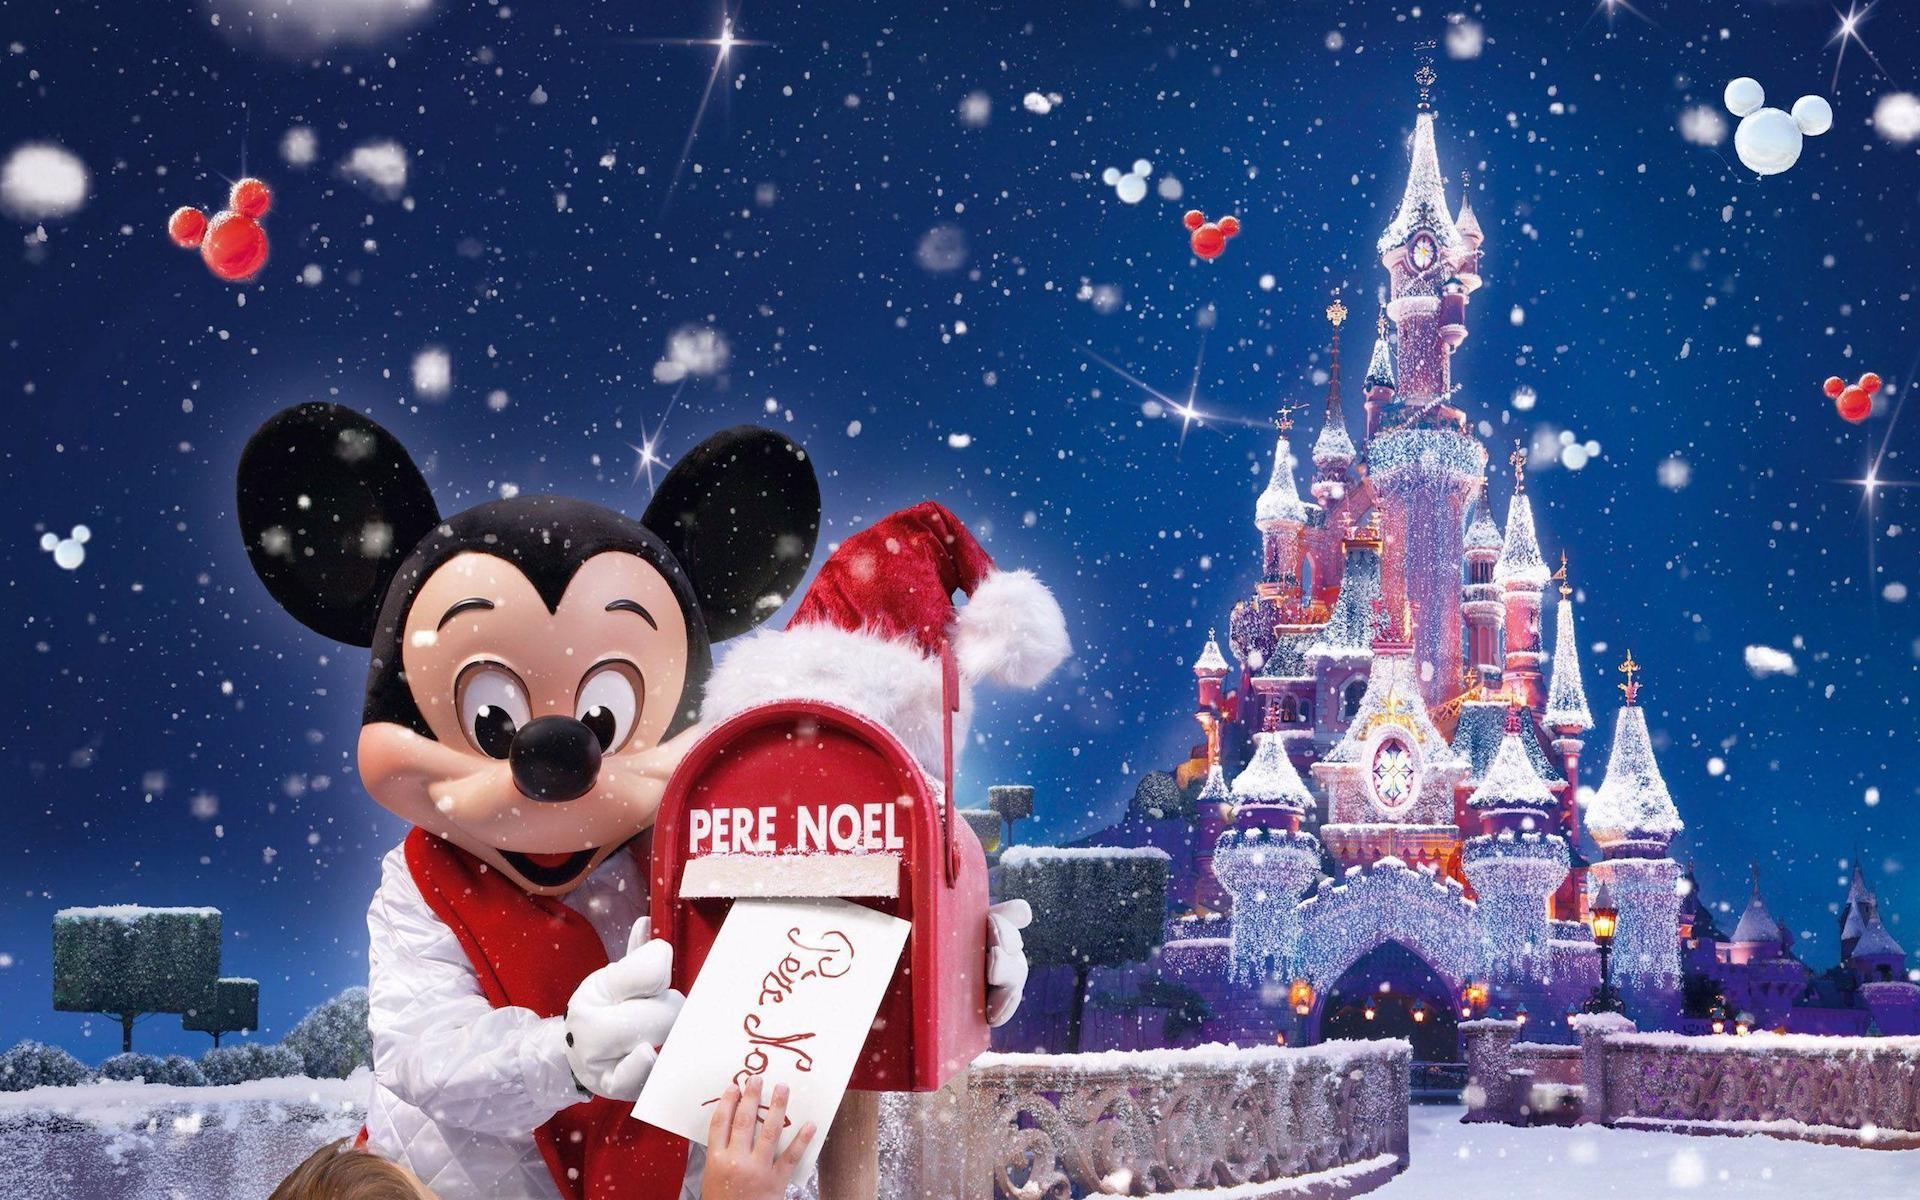 Mickey Mouse Christmas Wallpaper Widescreen.